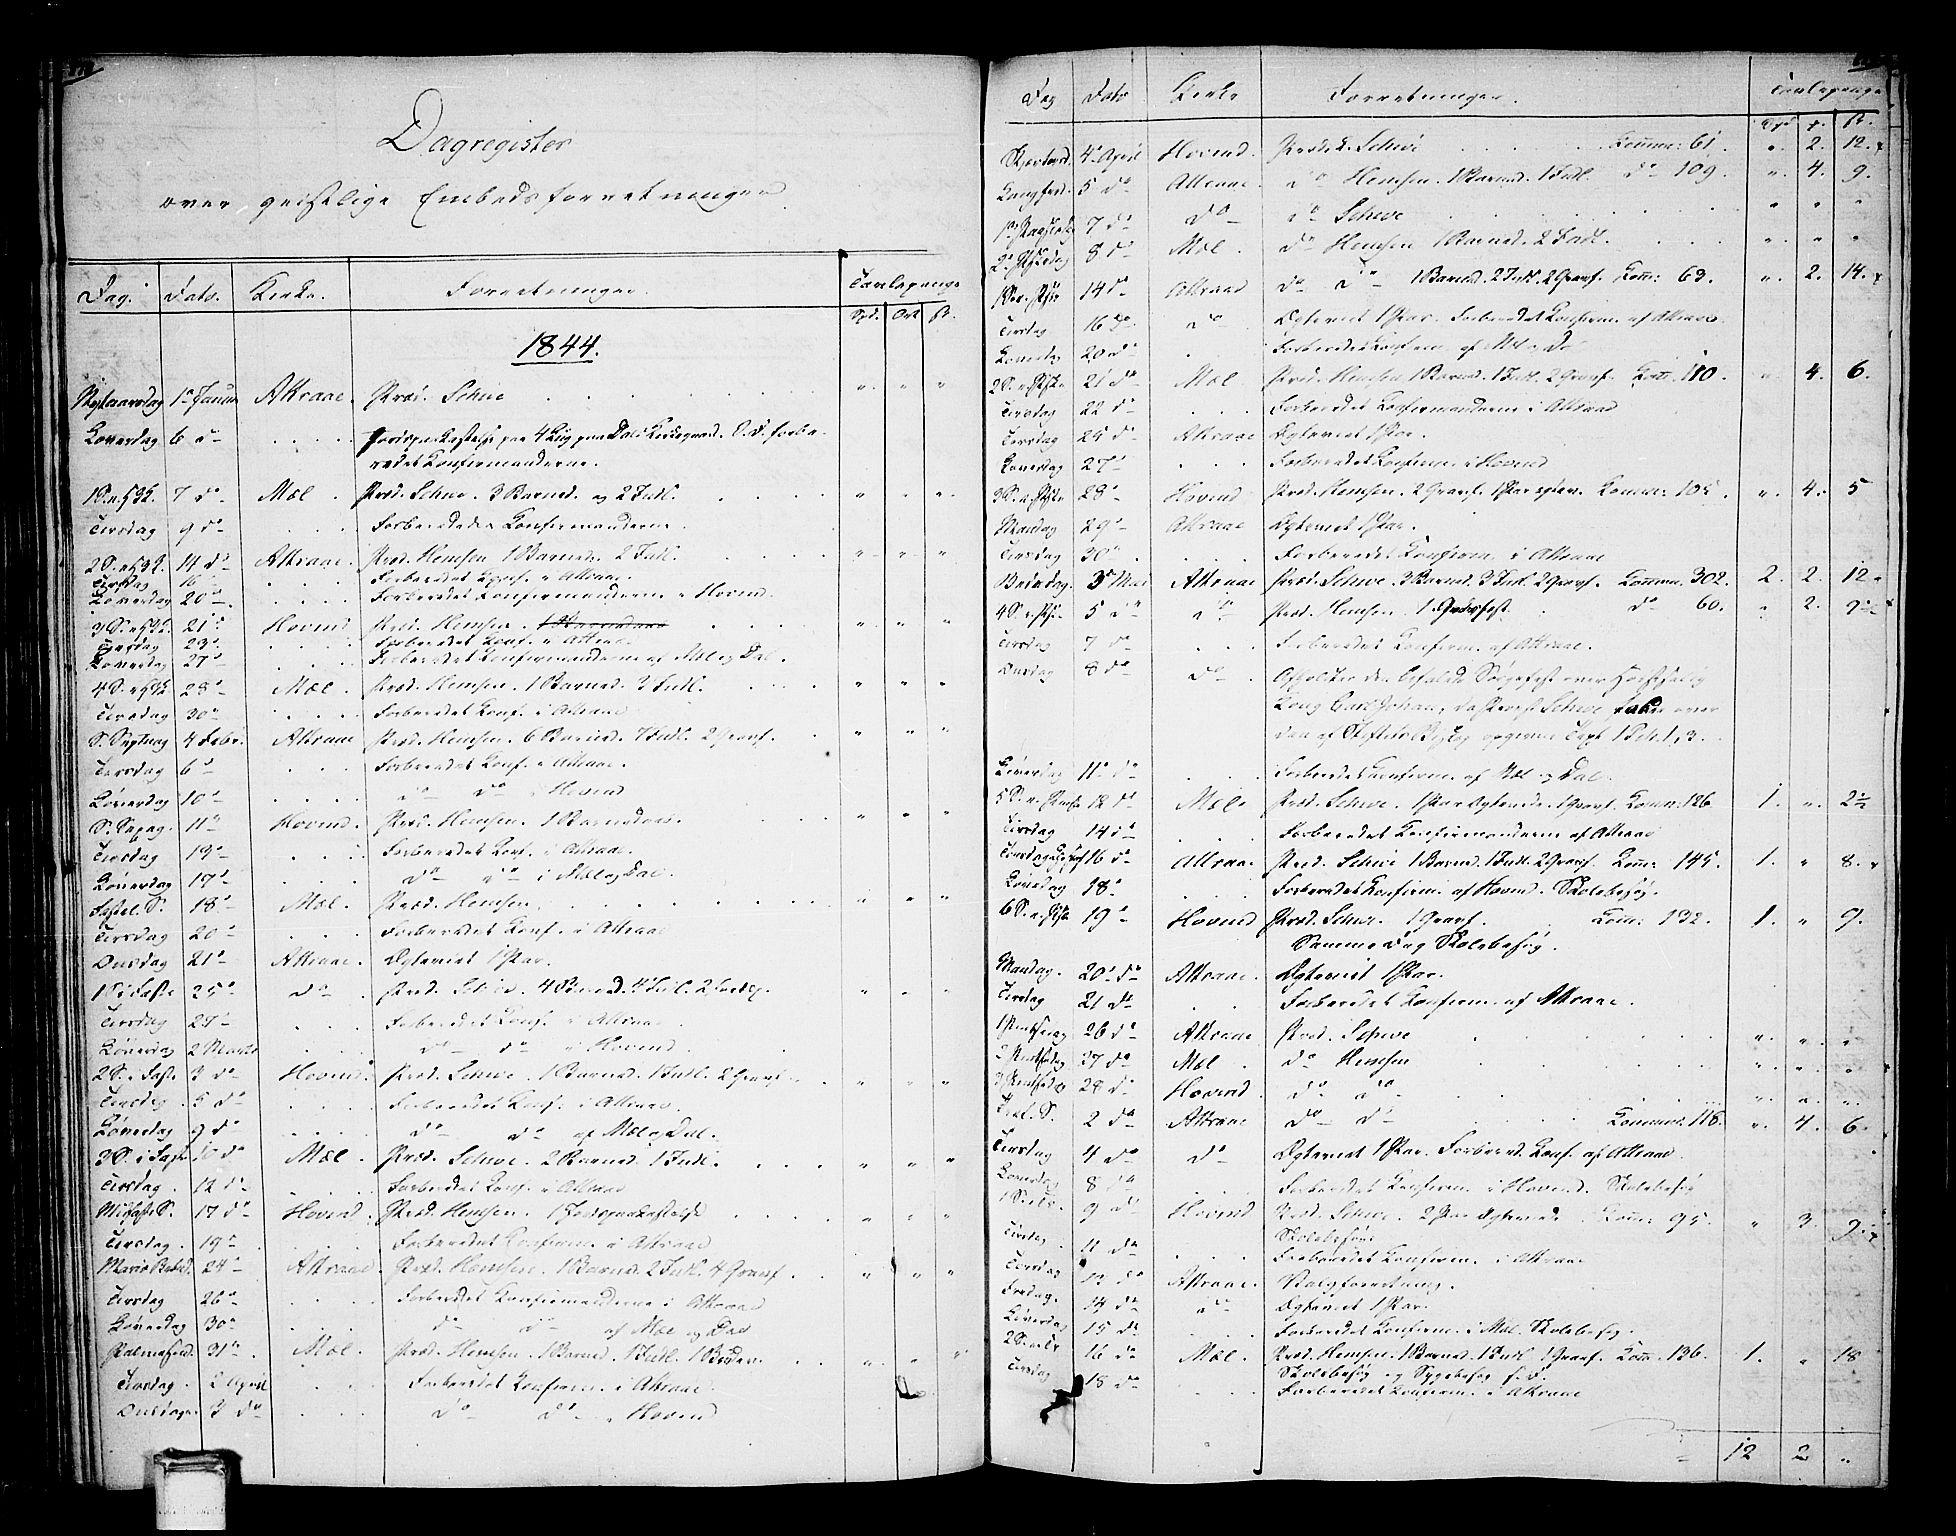 SAKO, Tinn kirkebøker, F/Fa/L0003: Ministerialbok nr. I 3, 1810-1814, s. 178-179